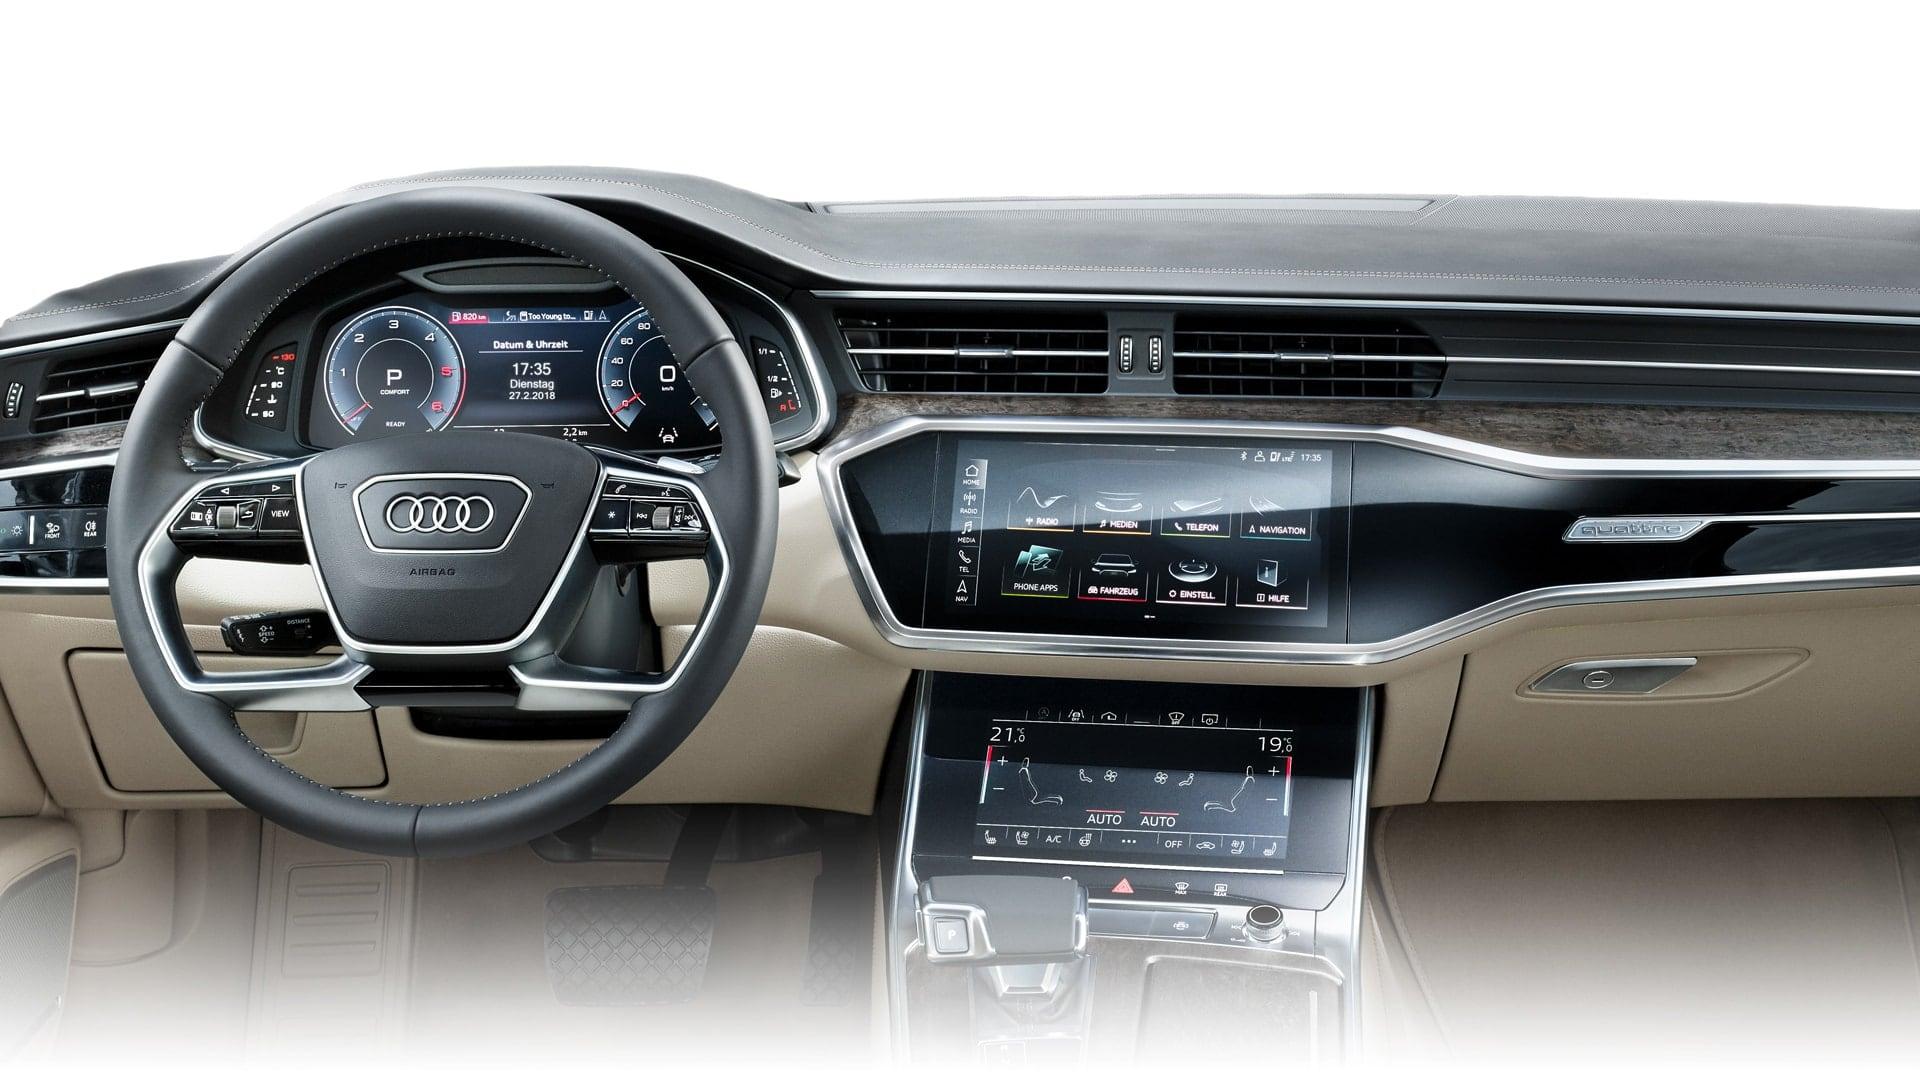 The 2019 Audi A6